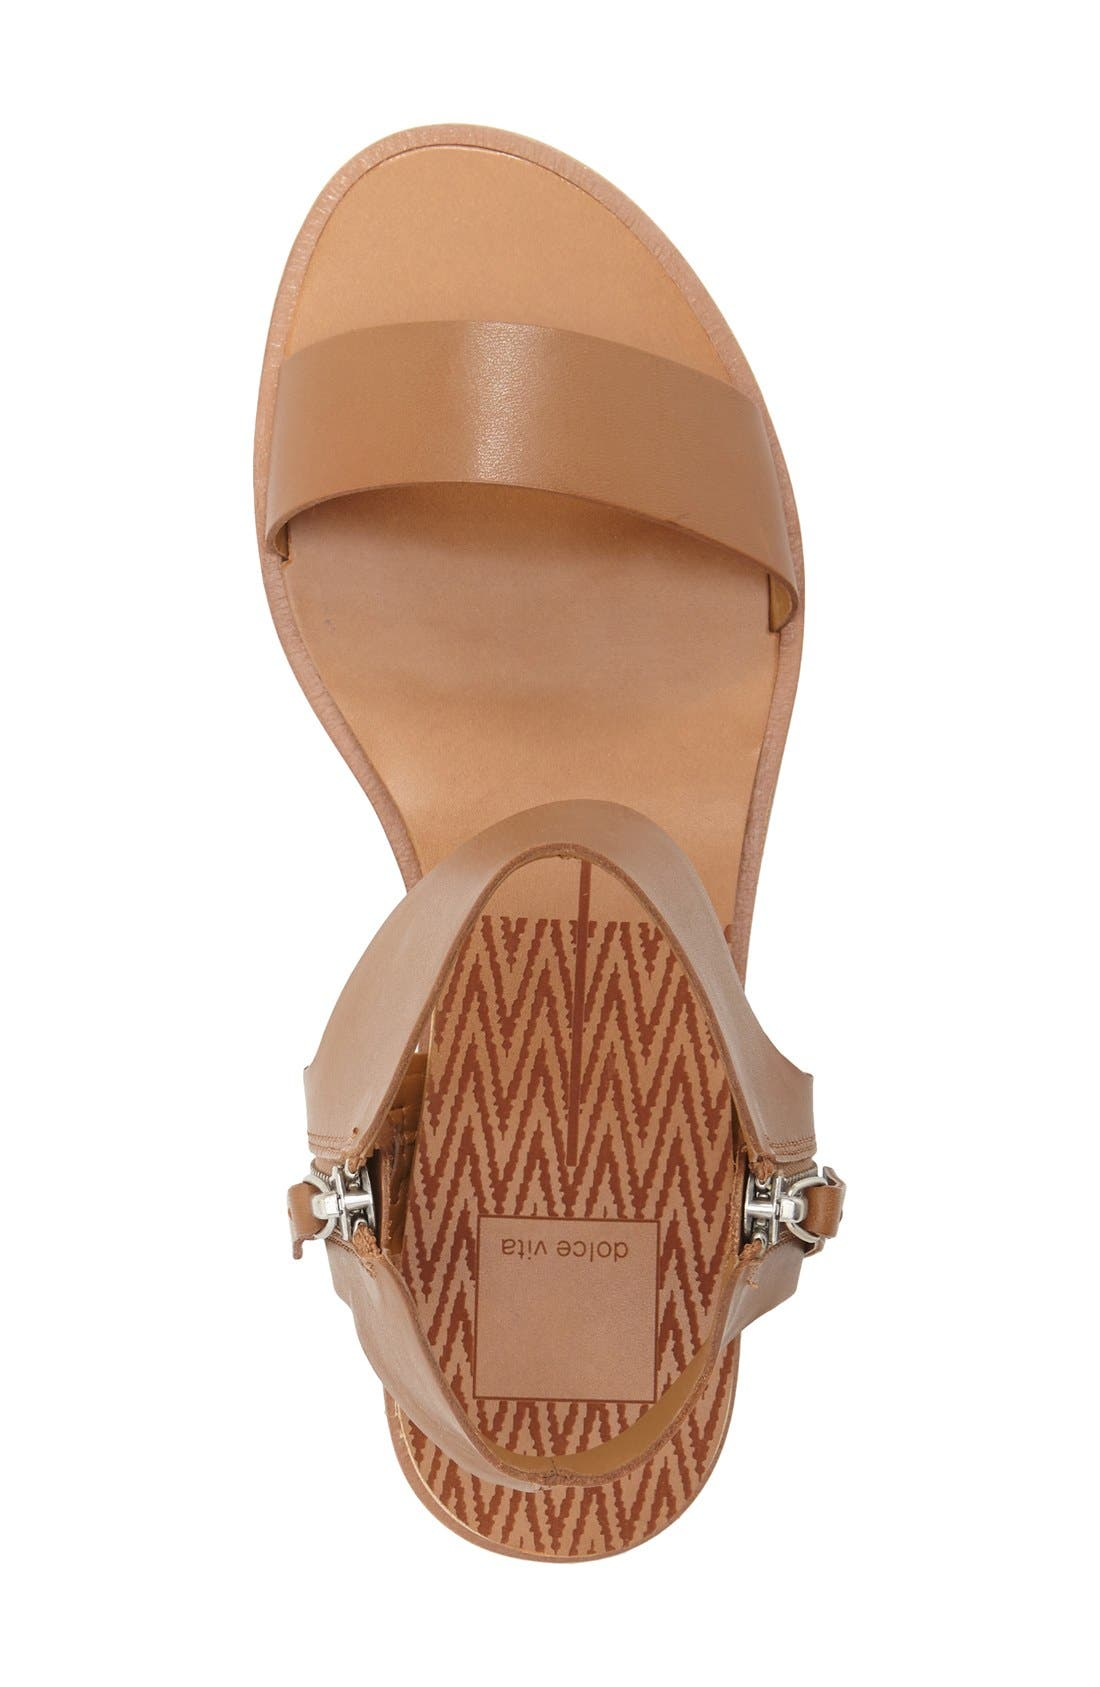 Alternate Image 3  - Dolce Vita 'Paris' Ankle Cuff Sandal (Women)